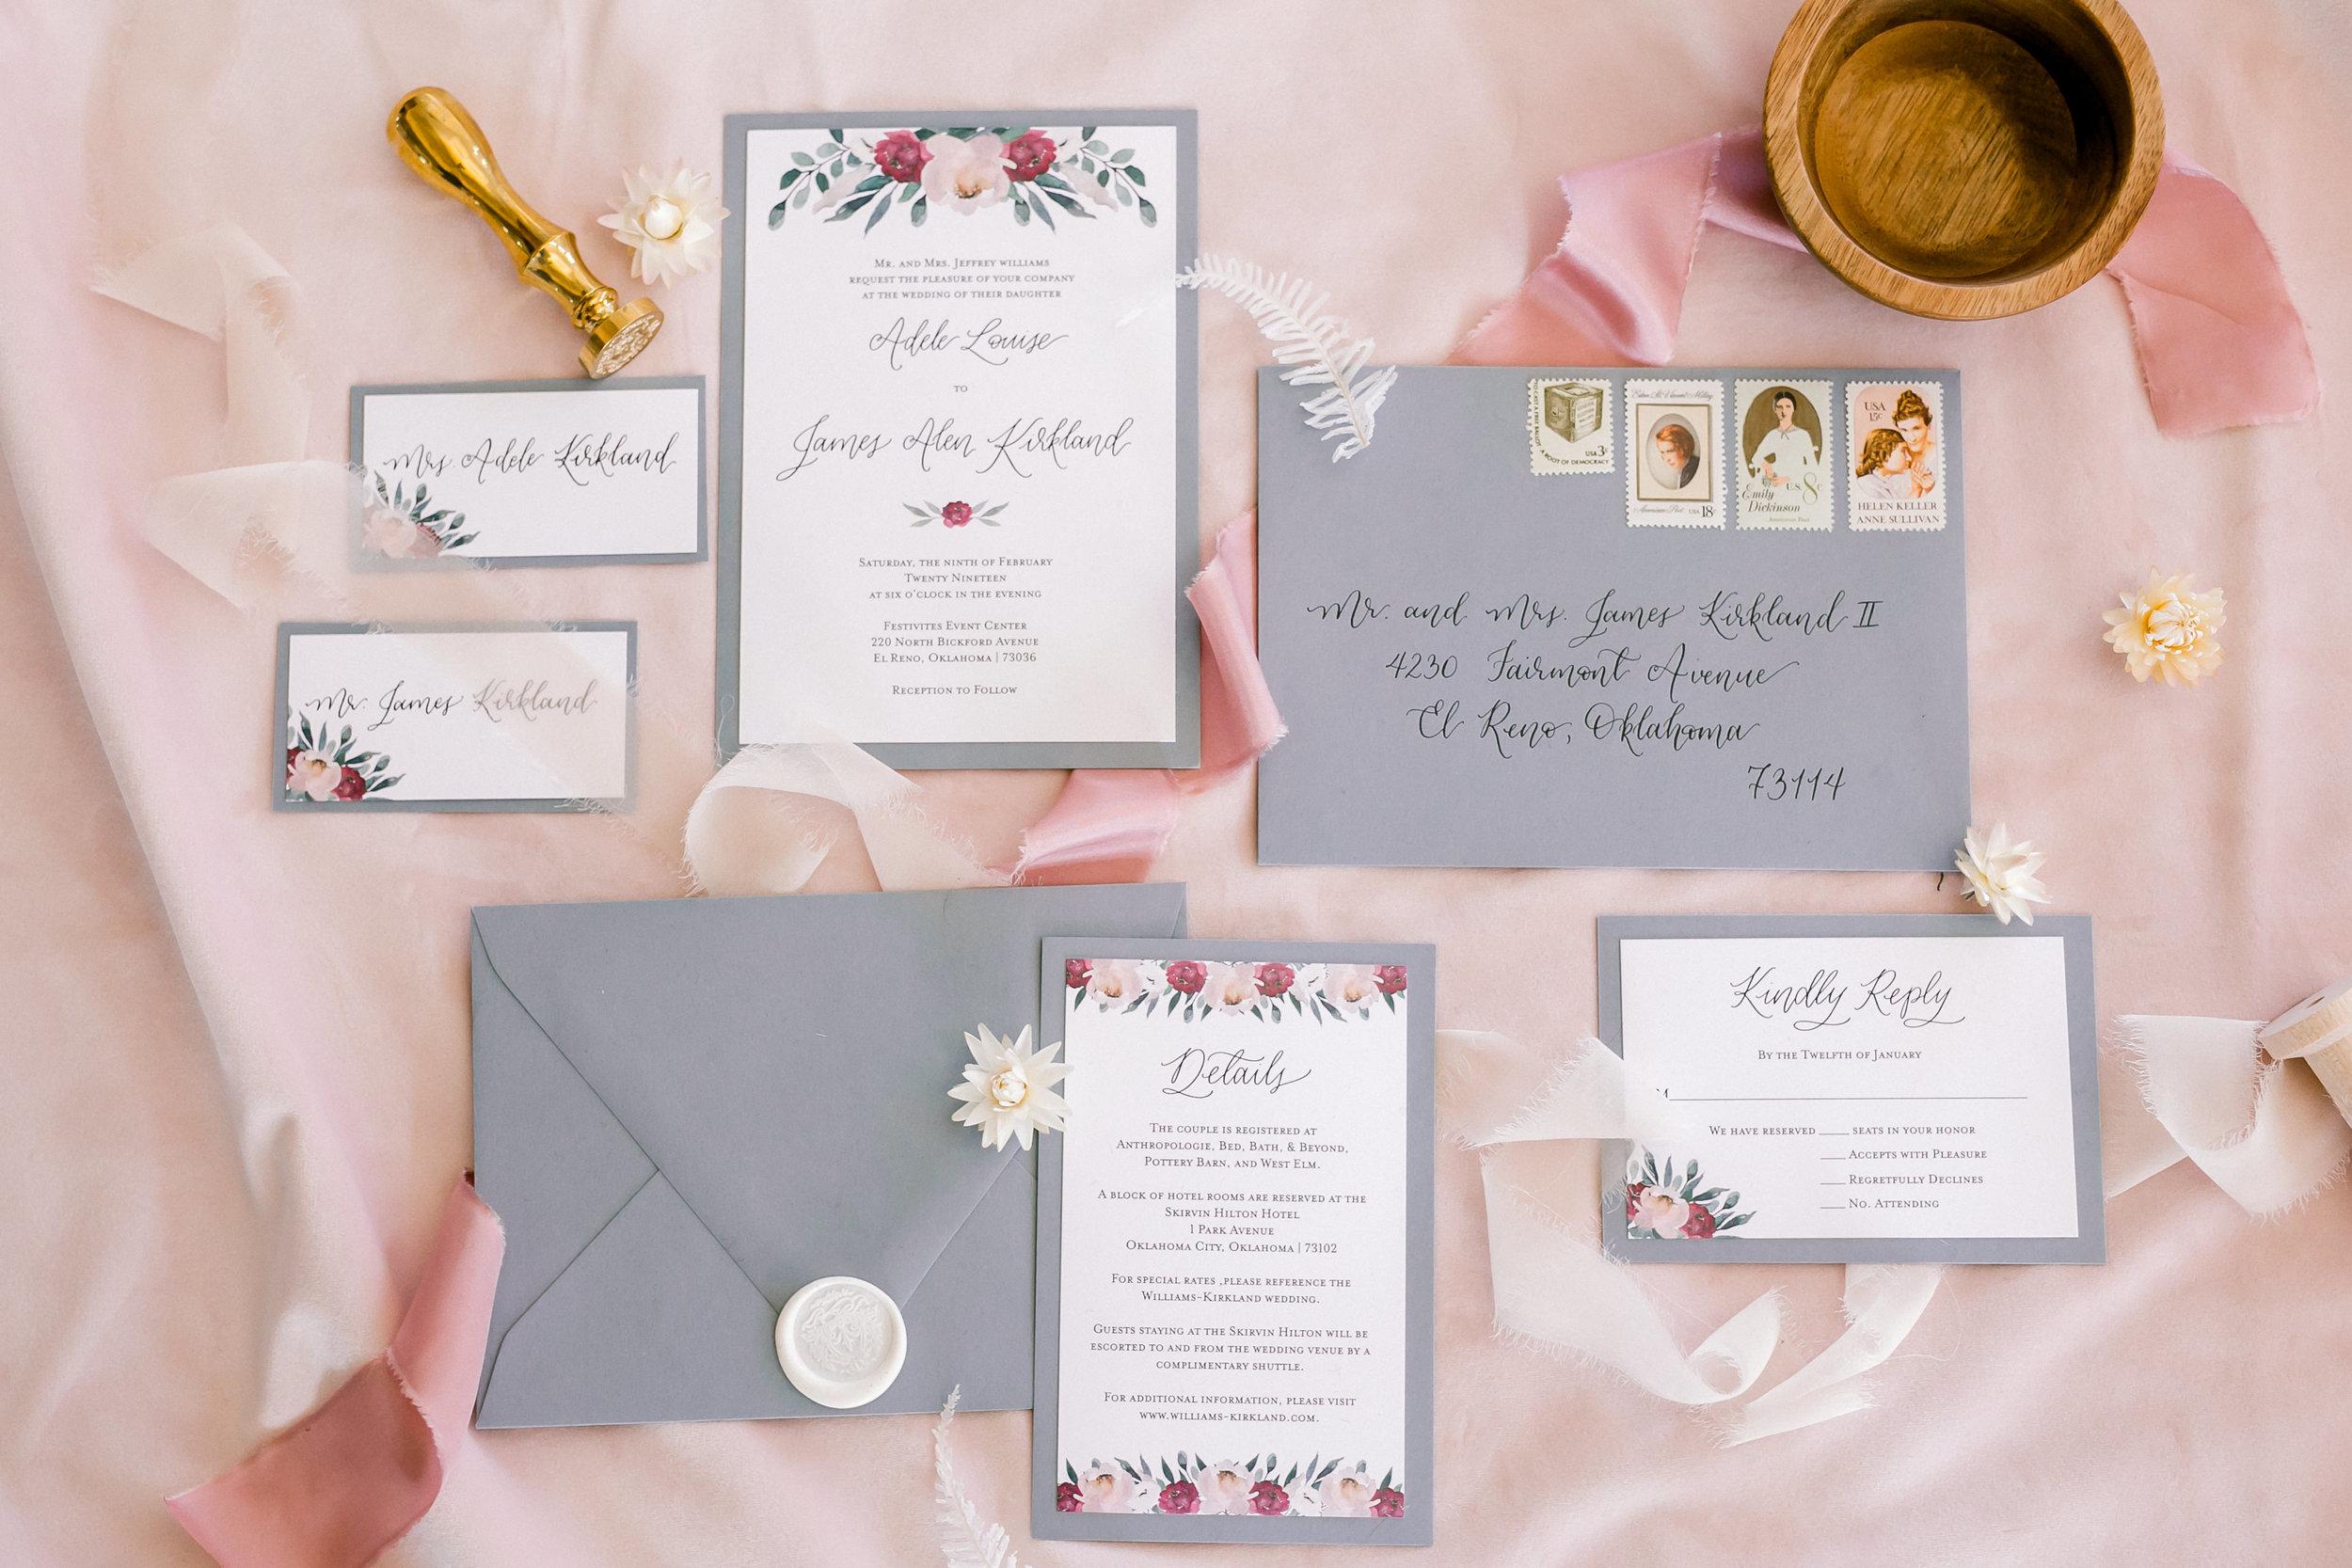 Festivities-Event-Center-Wedding-Oklahoma-City-Wedding-Photographer-Emily-Nicole-Photo-222.jpg